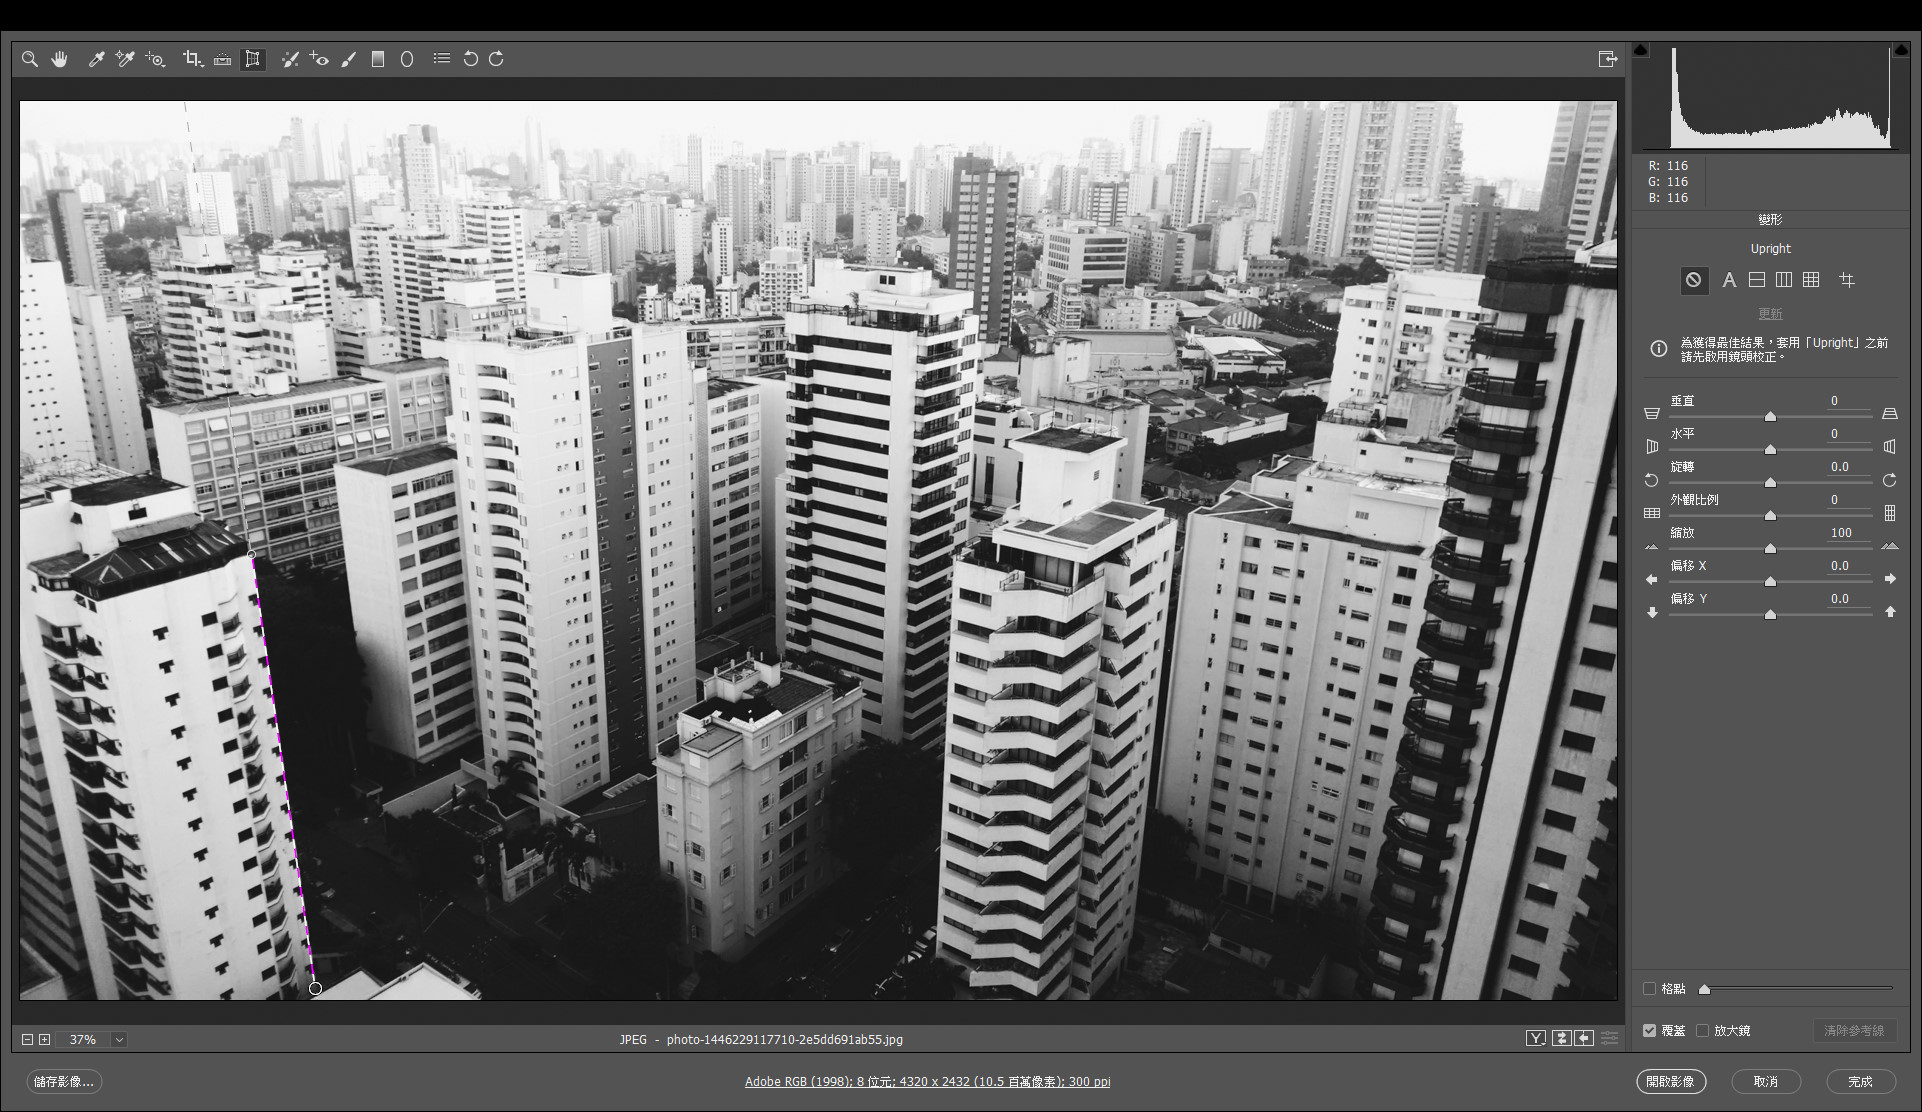 photoshop-deformation-correction 03